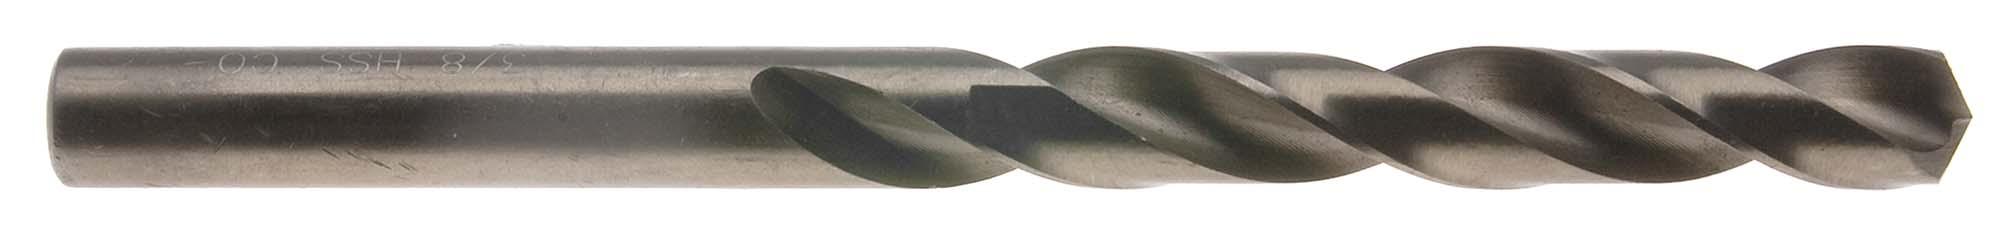 "#1 (.2280"") Cobalt Jobber Length Drill Bit"